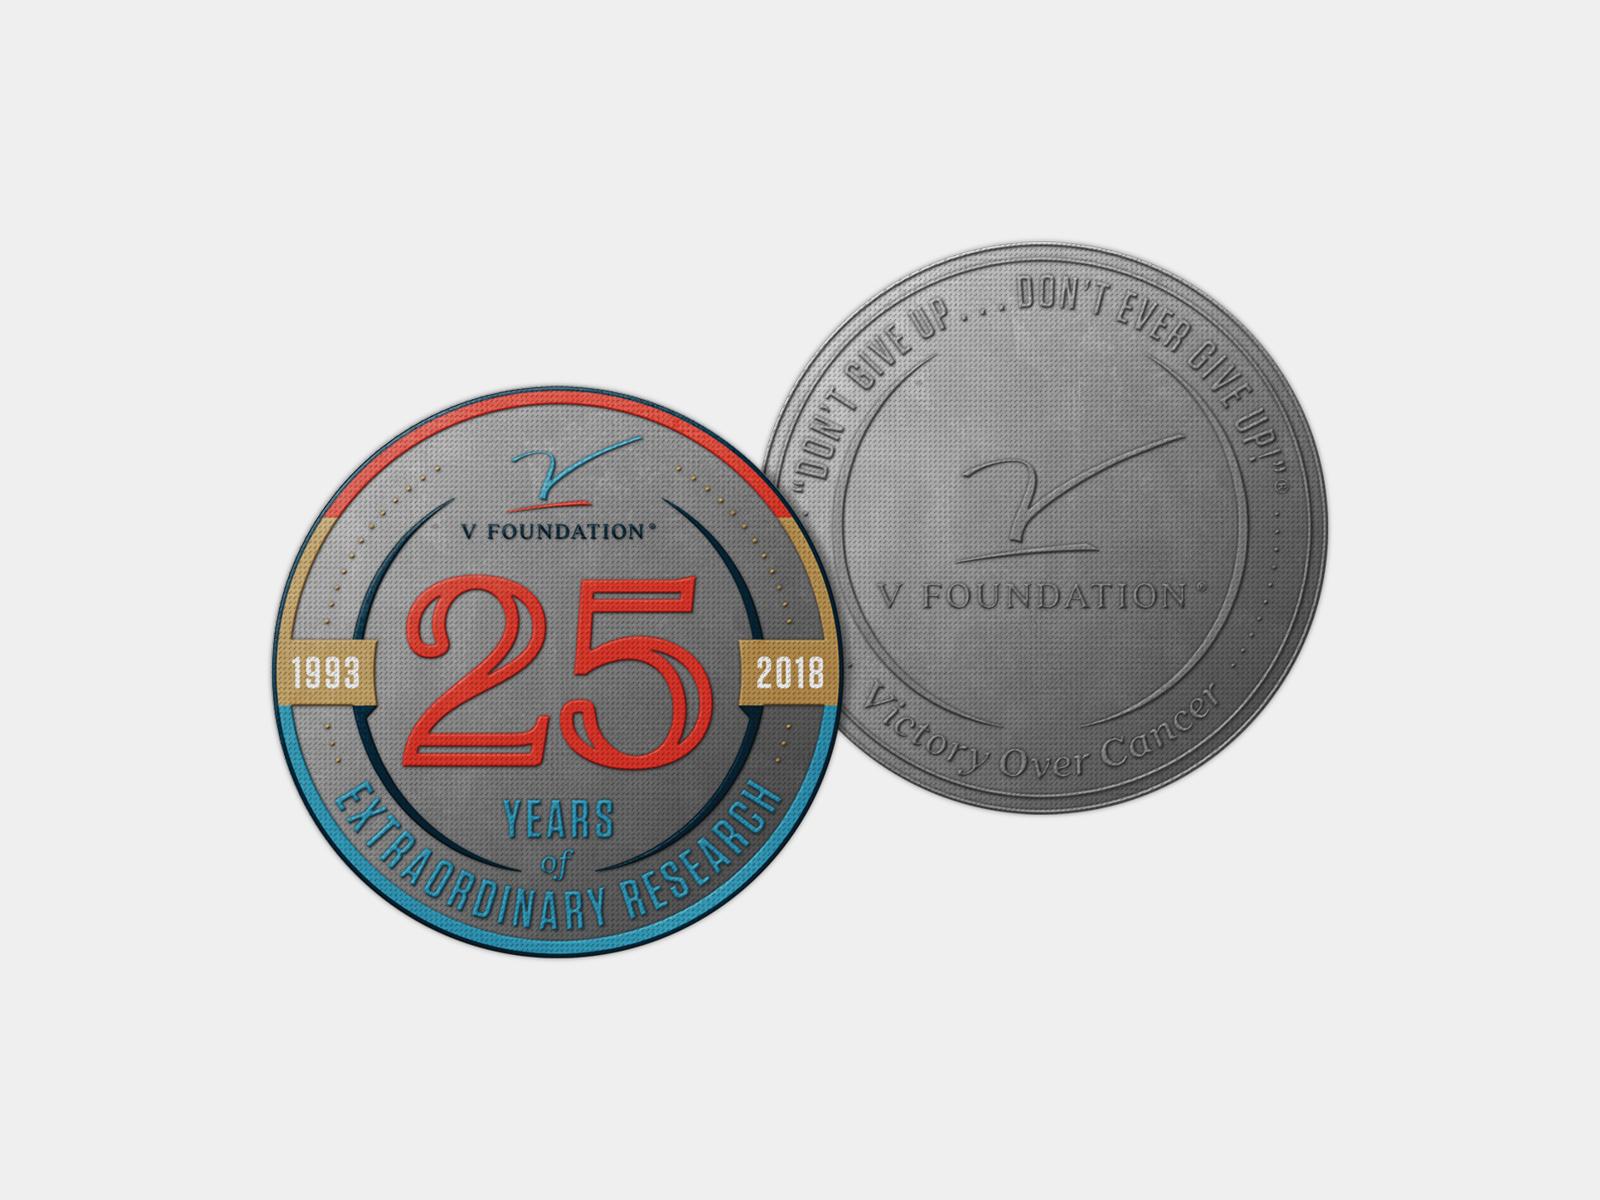 V foundation coin